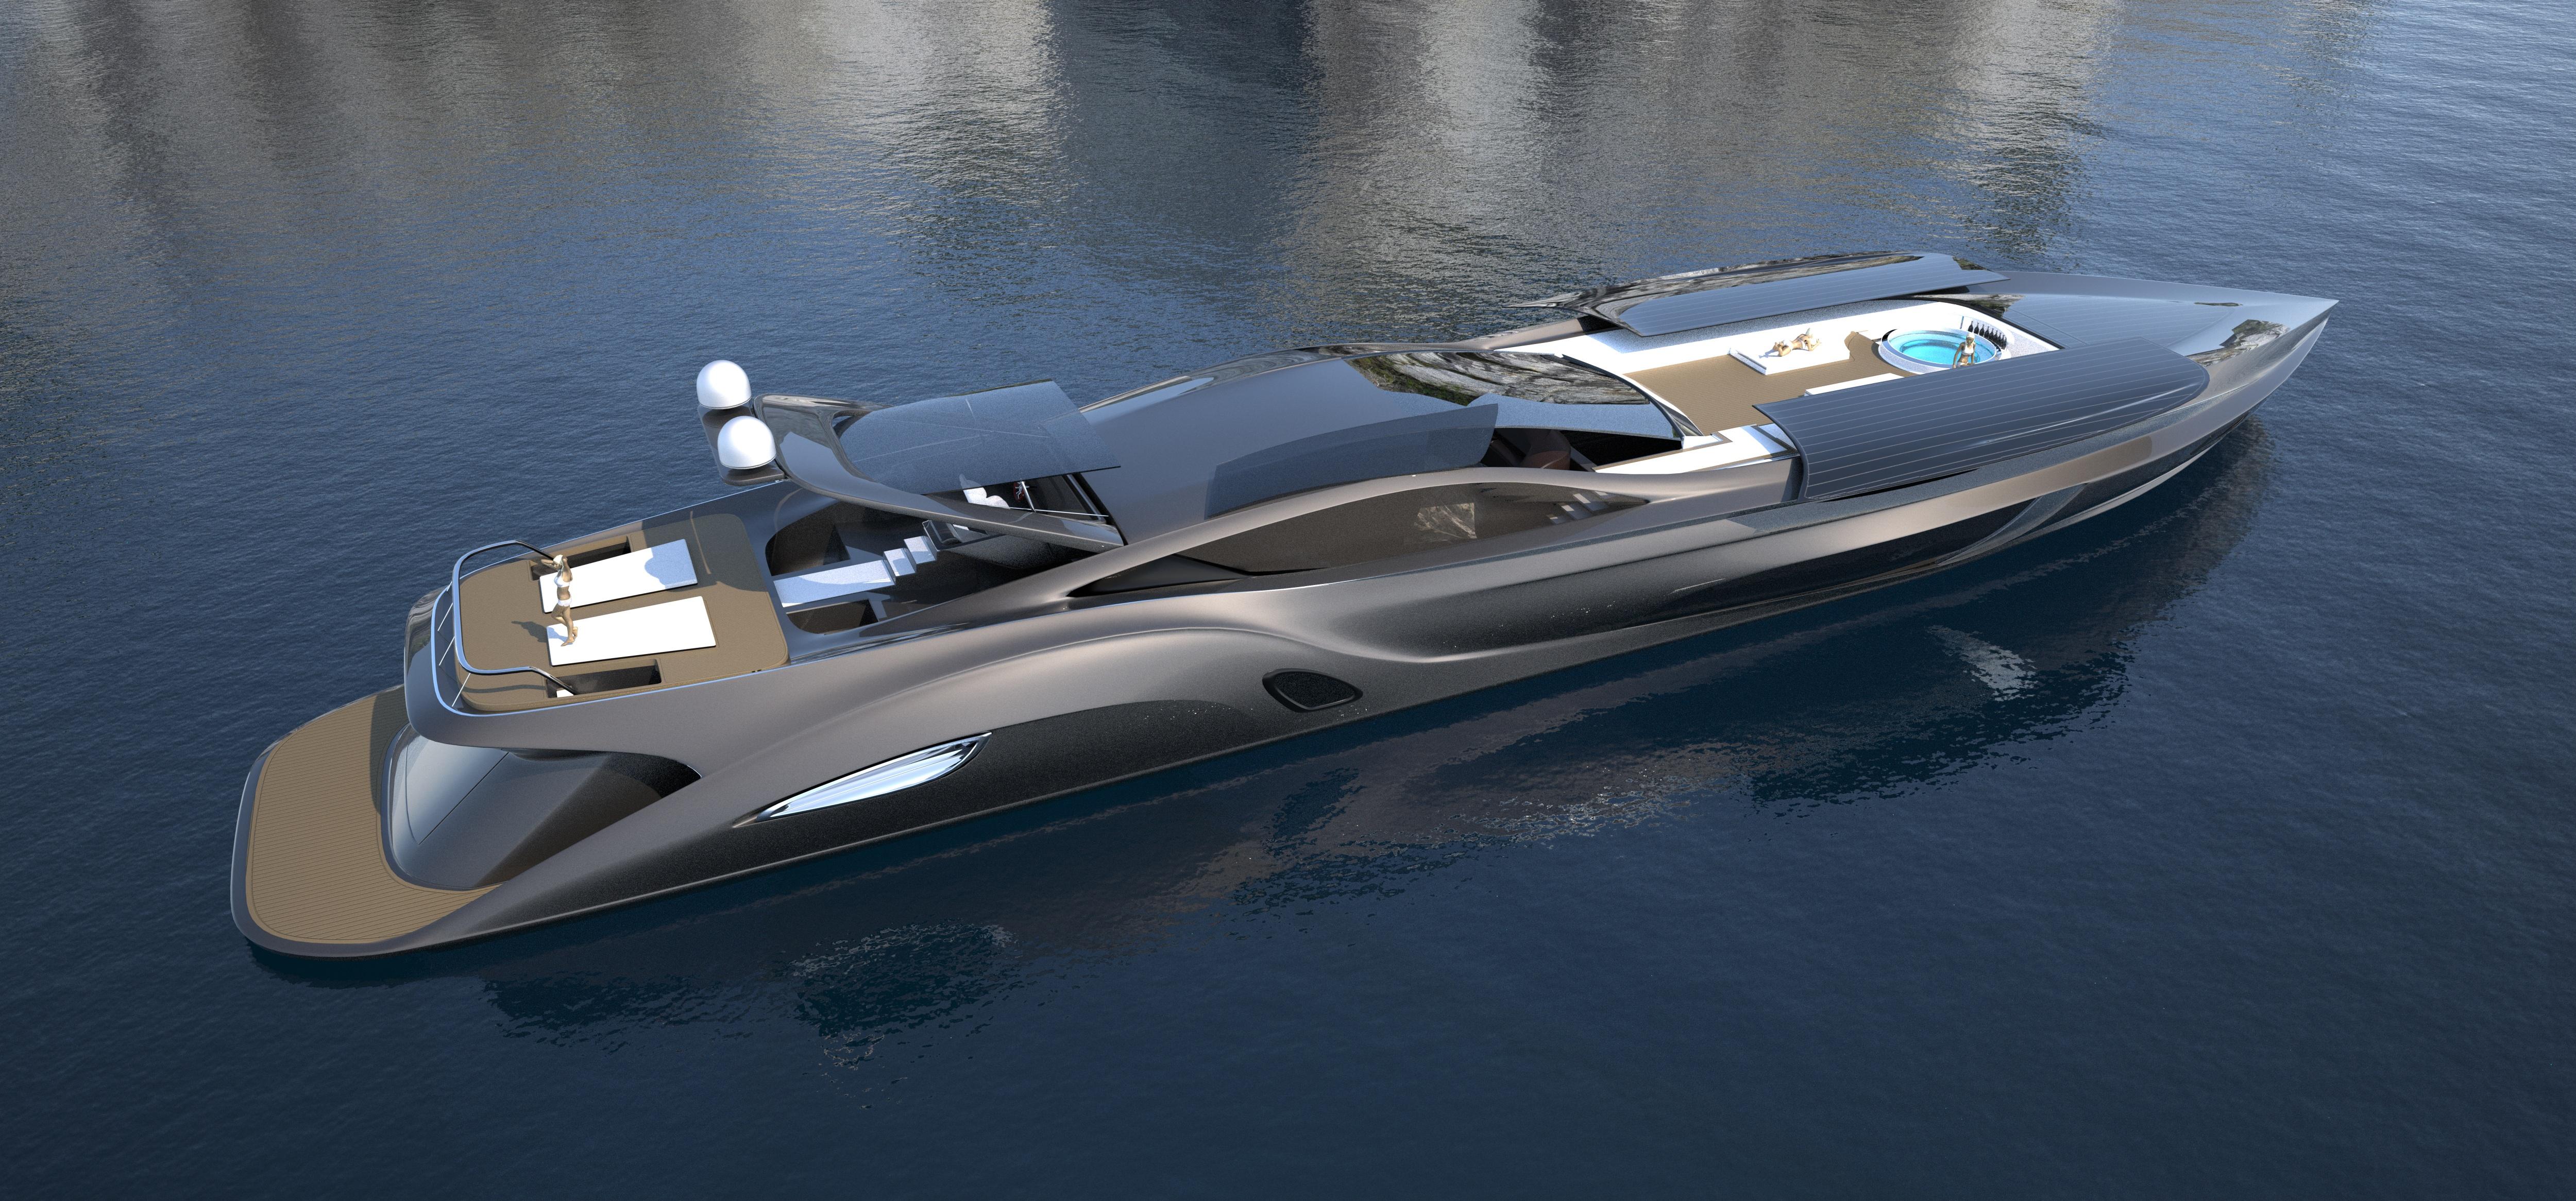 Yachts For Sale maschinen williamhill schlitz william hill sign up offer cuanto tarda williamhill en pagar